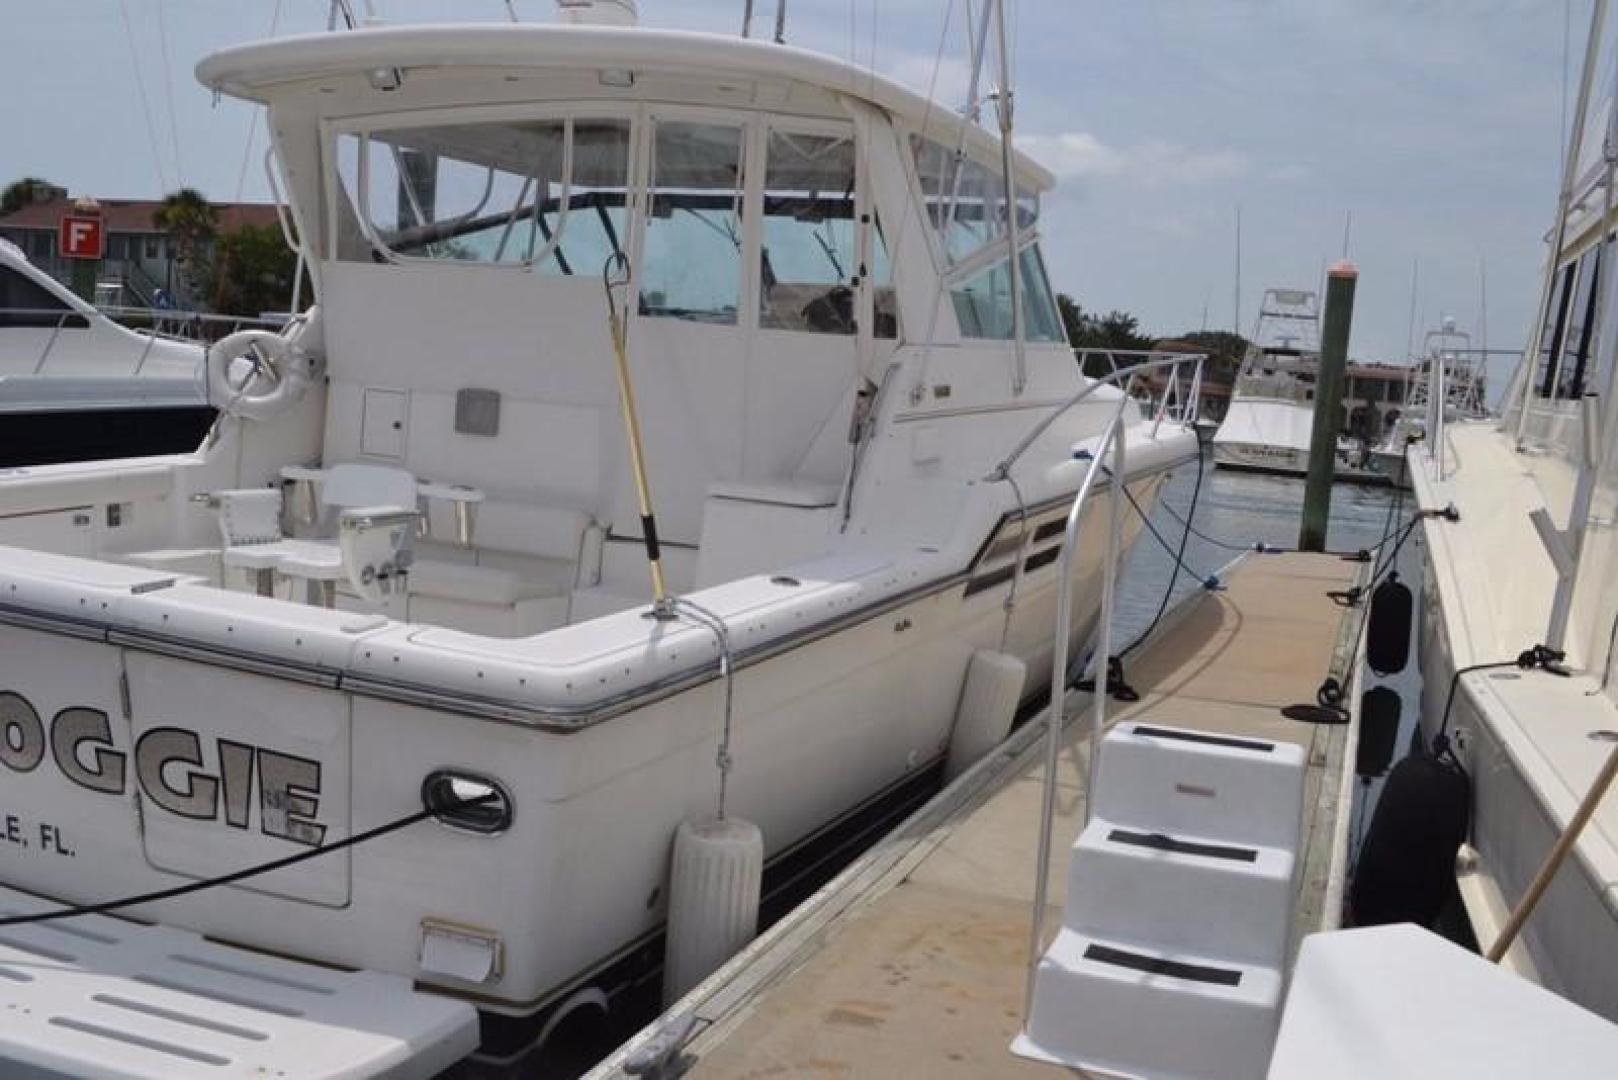 Tiara-4100 Open 2000-Moondoggie St. Augustine-Florida-United States-Starboard Aft Quarter-924419 | Thumbnail